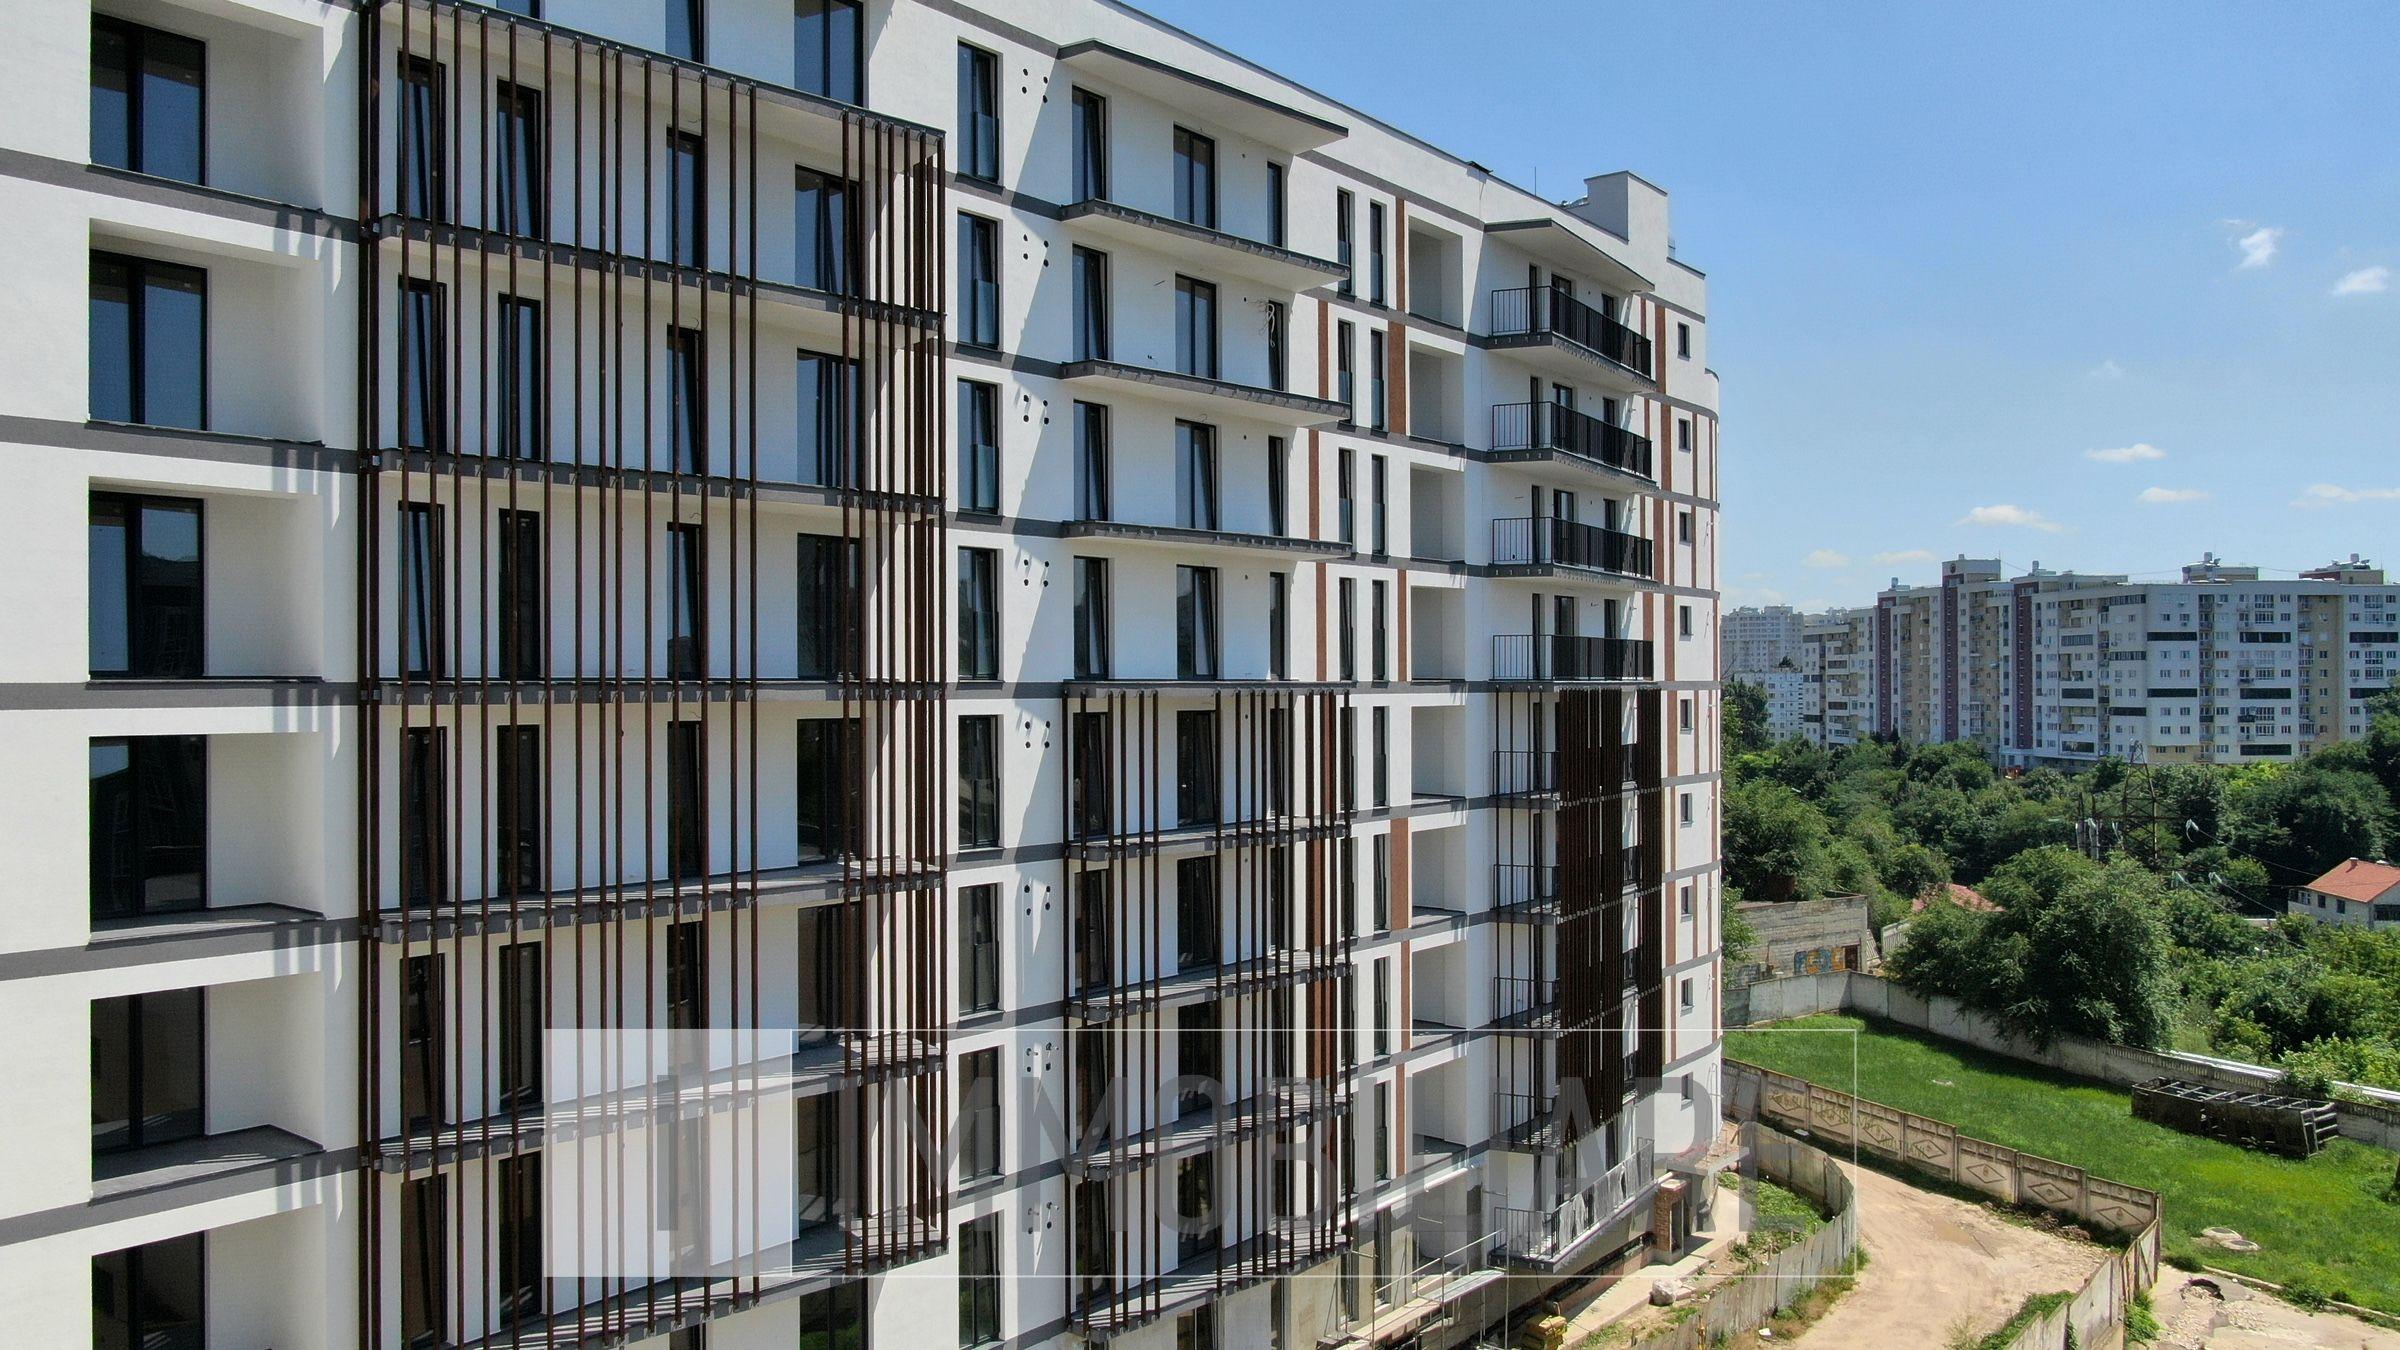 Apartament cu 2 camere+living, sect. Centru, str. Pan Halippa.